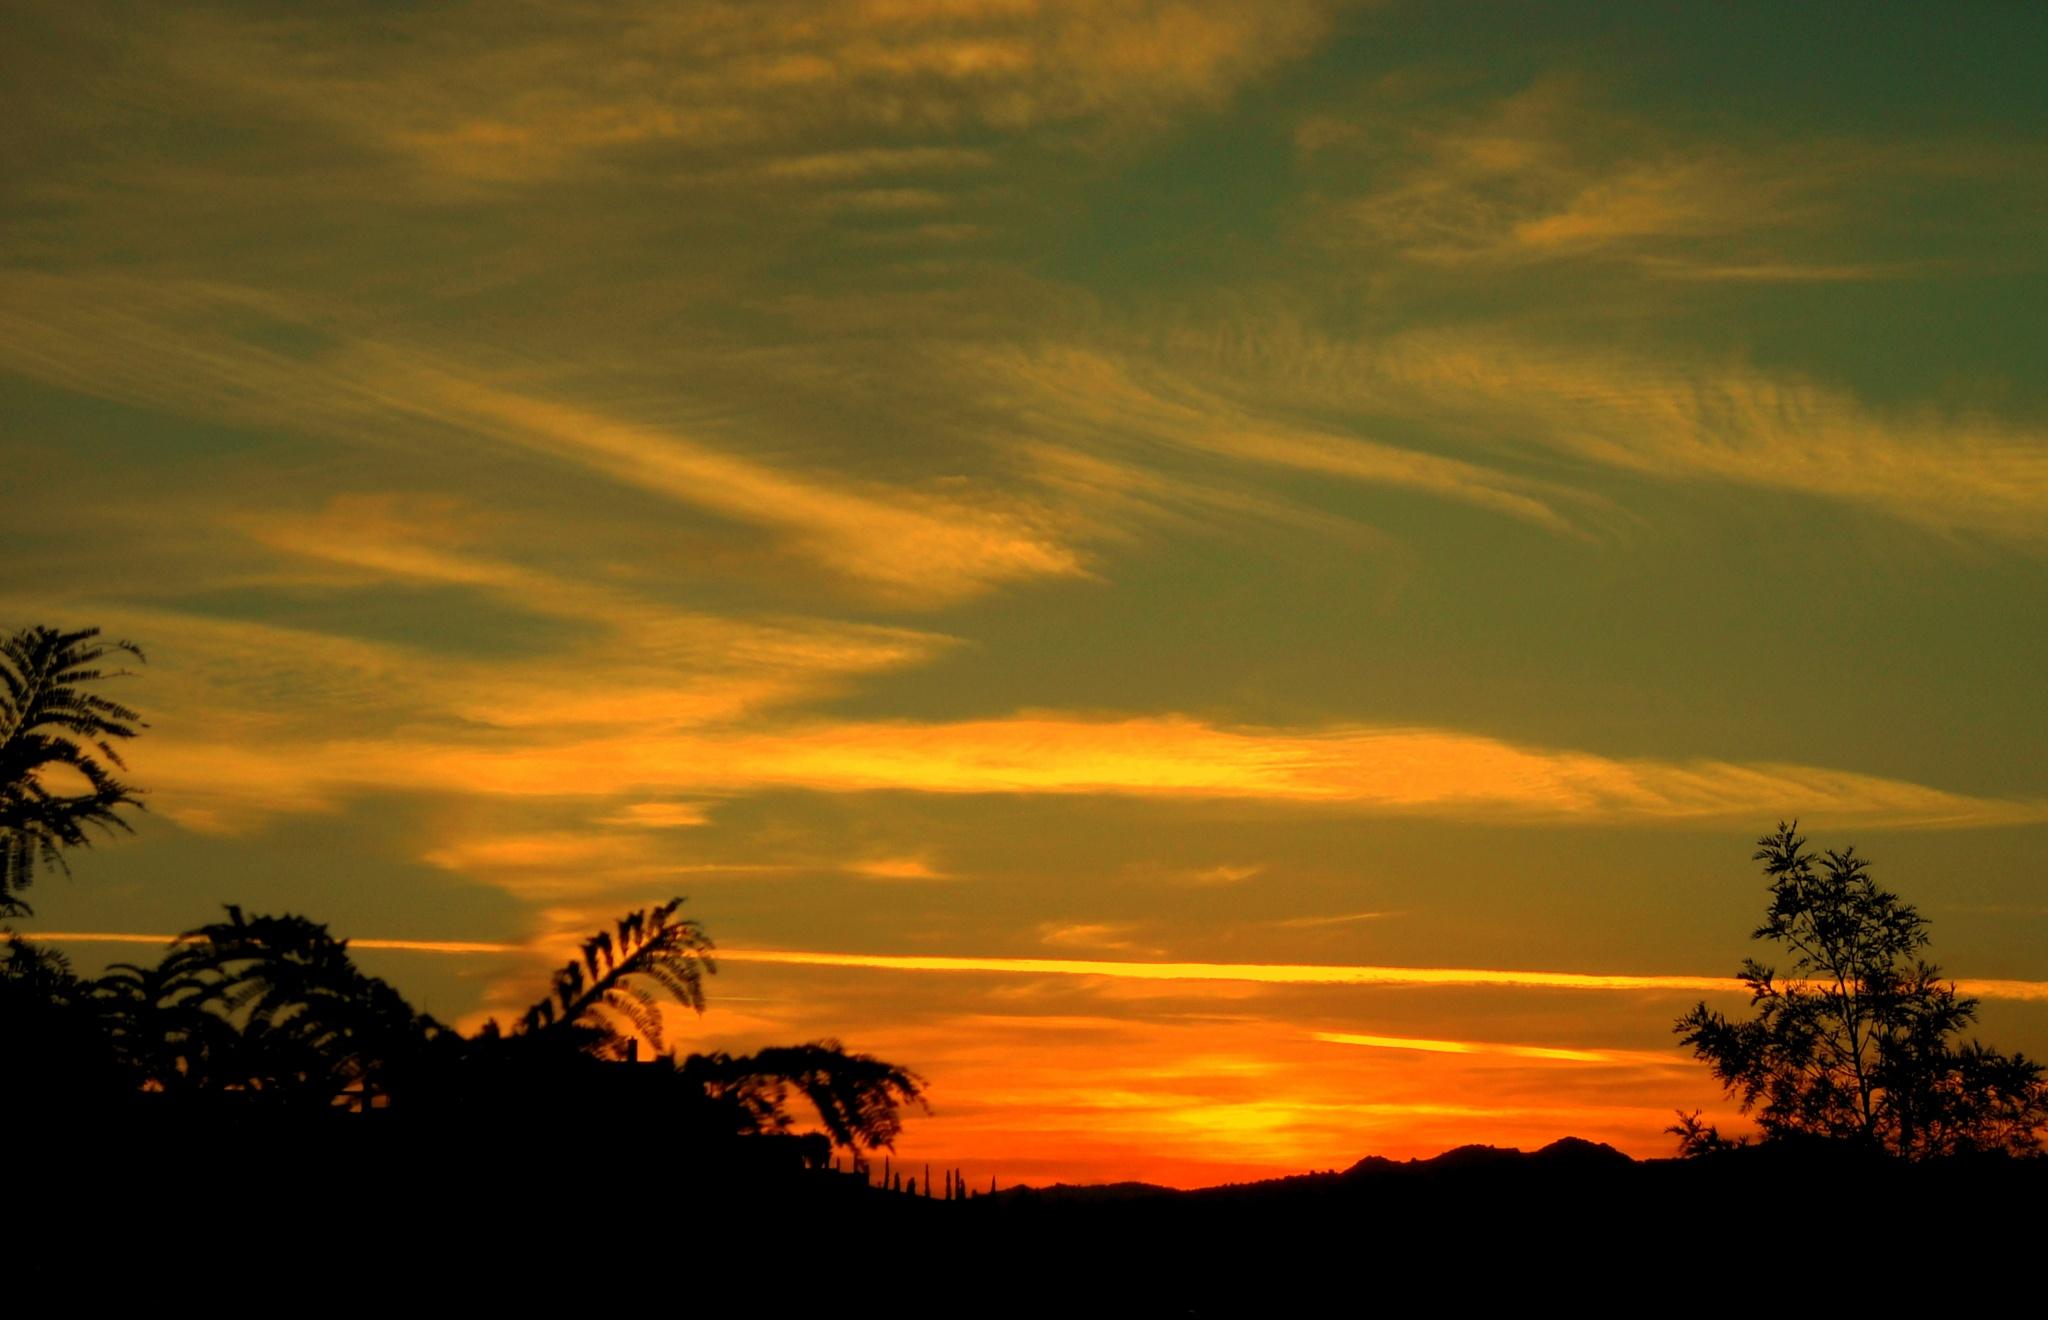 FORGOTTEN SUNSETS 9 by Akin Saner